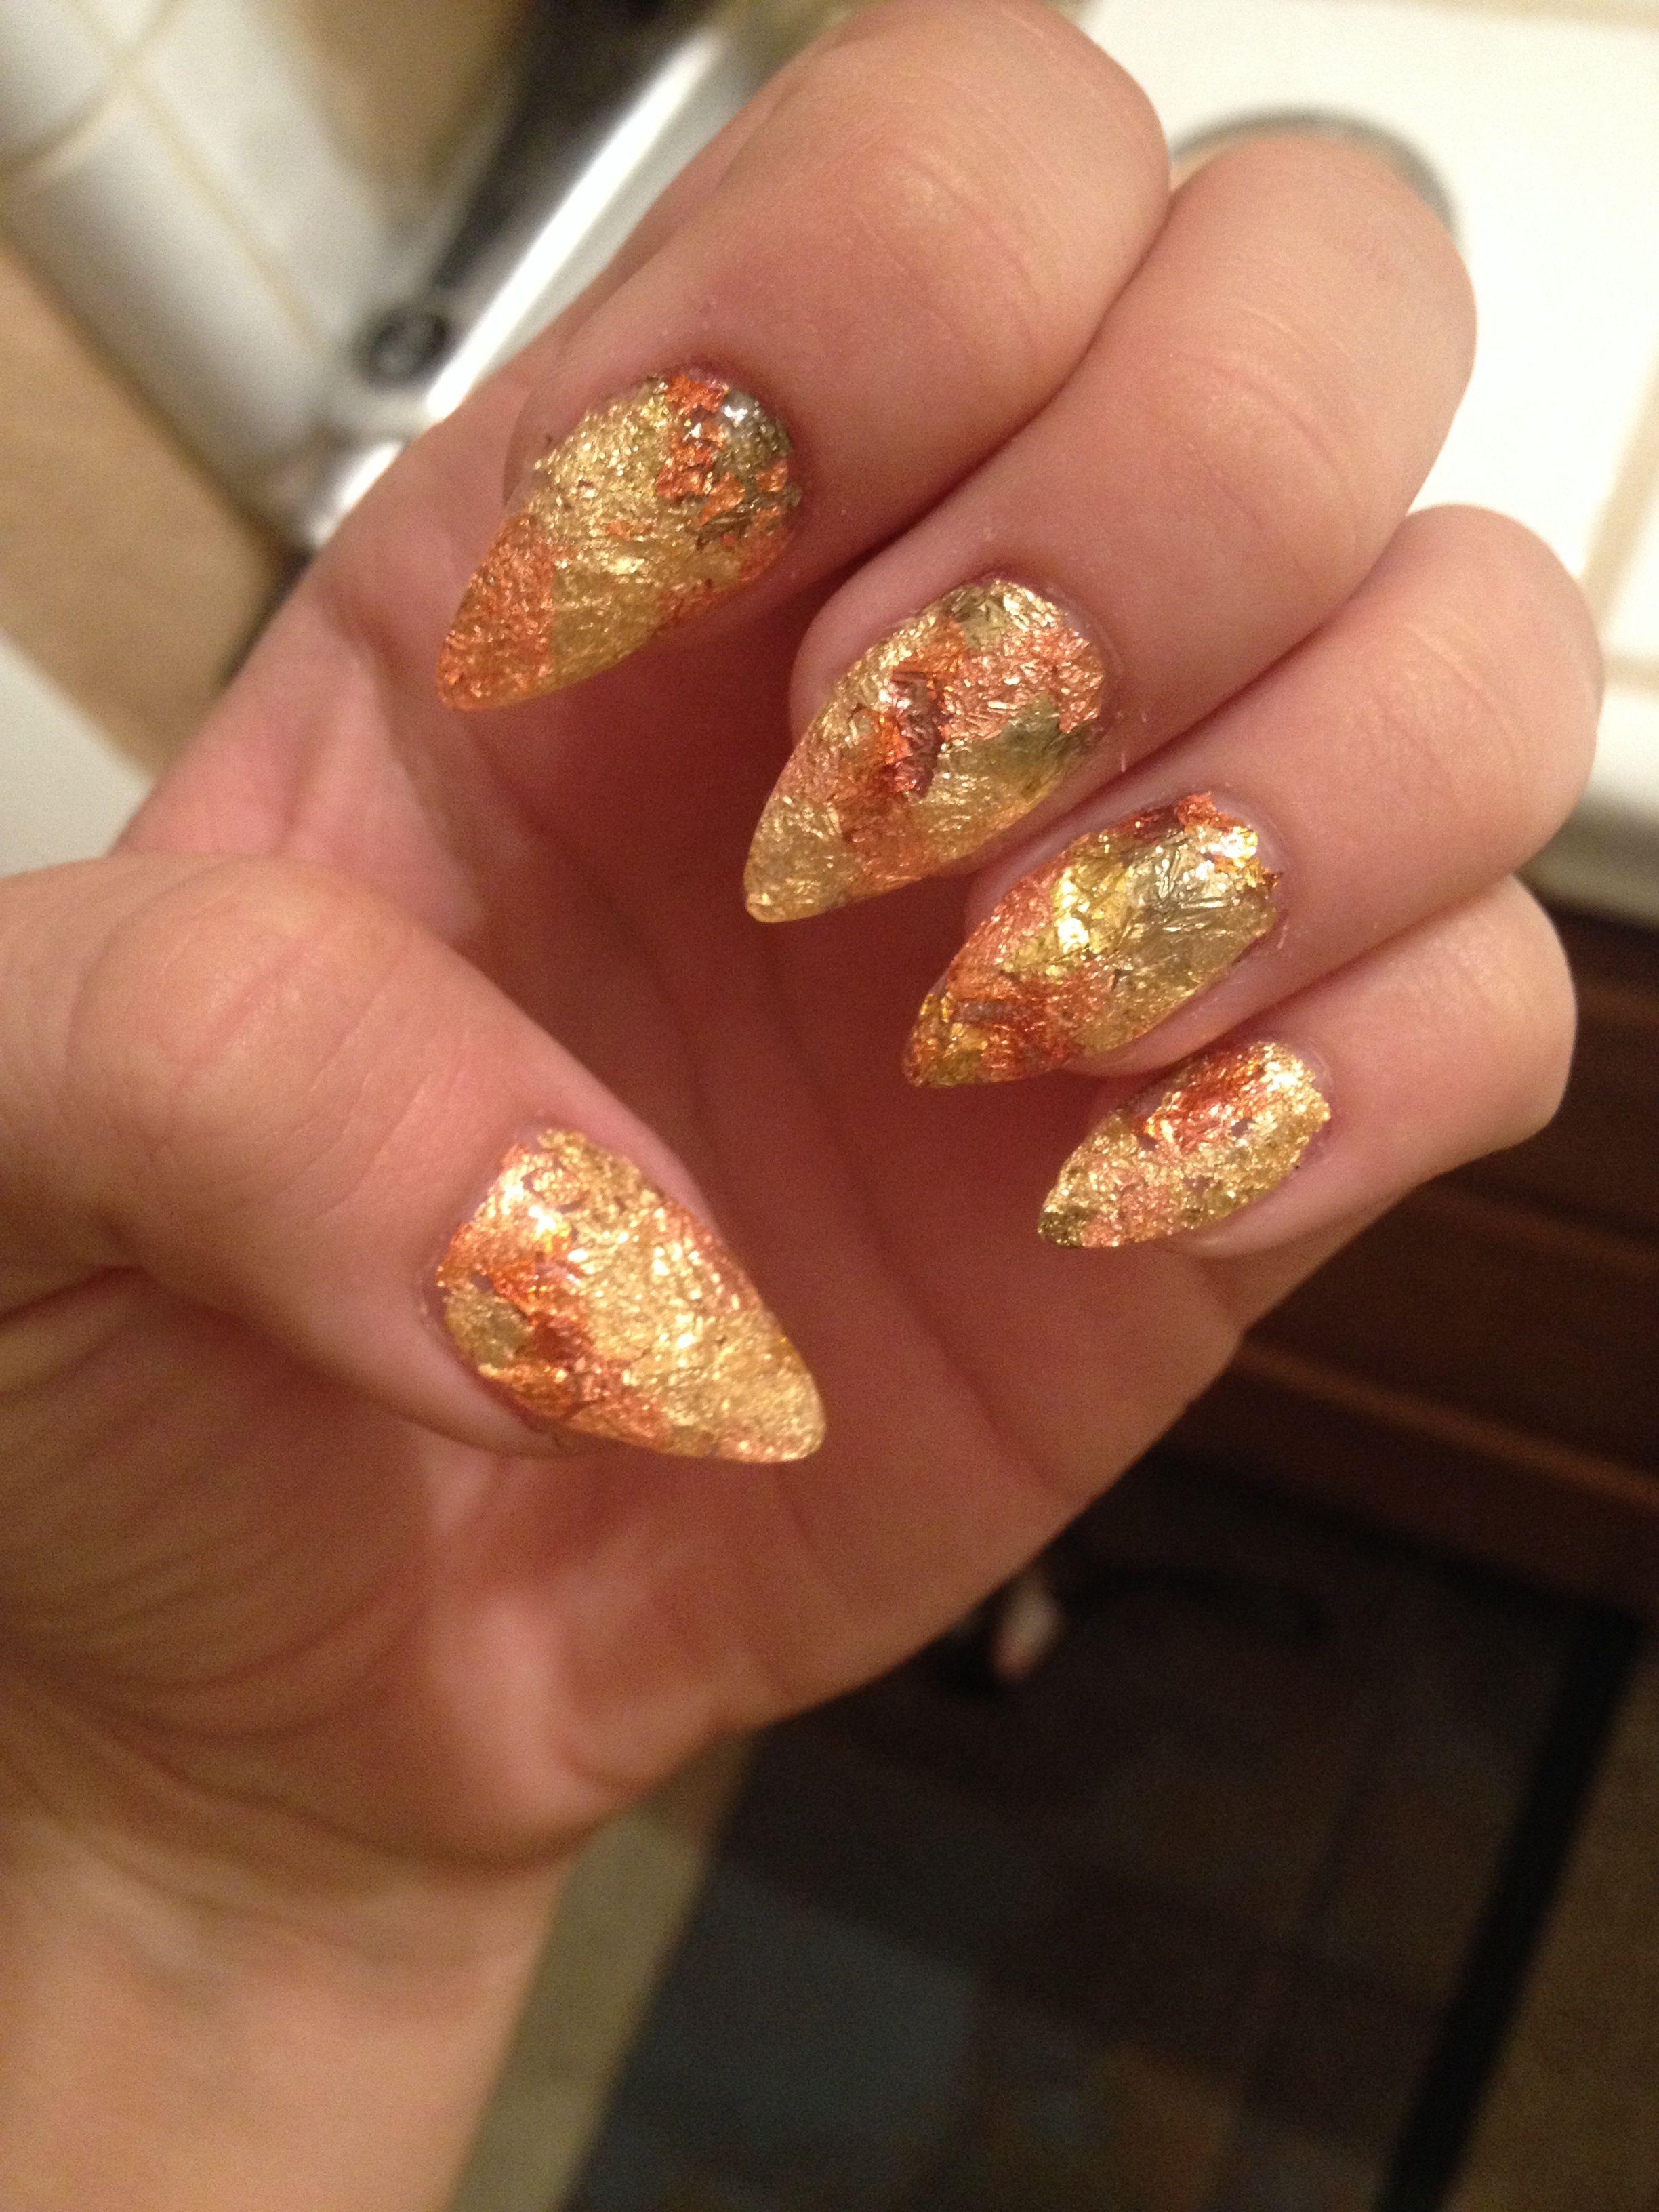 Fall Stiletto Nails Gold Orange Copper Fall Colors Gel Nails Stiletto Nails Designs Stiletto Nails Gold Nails